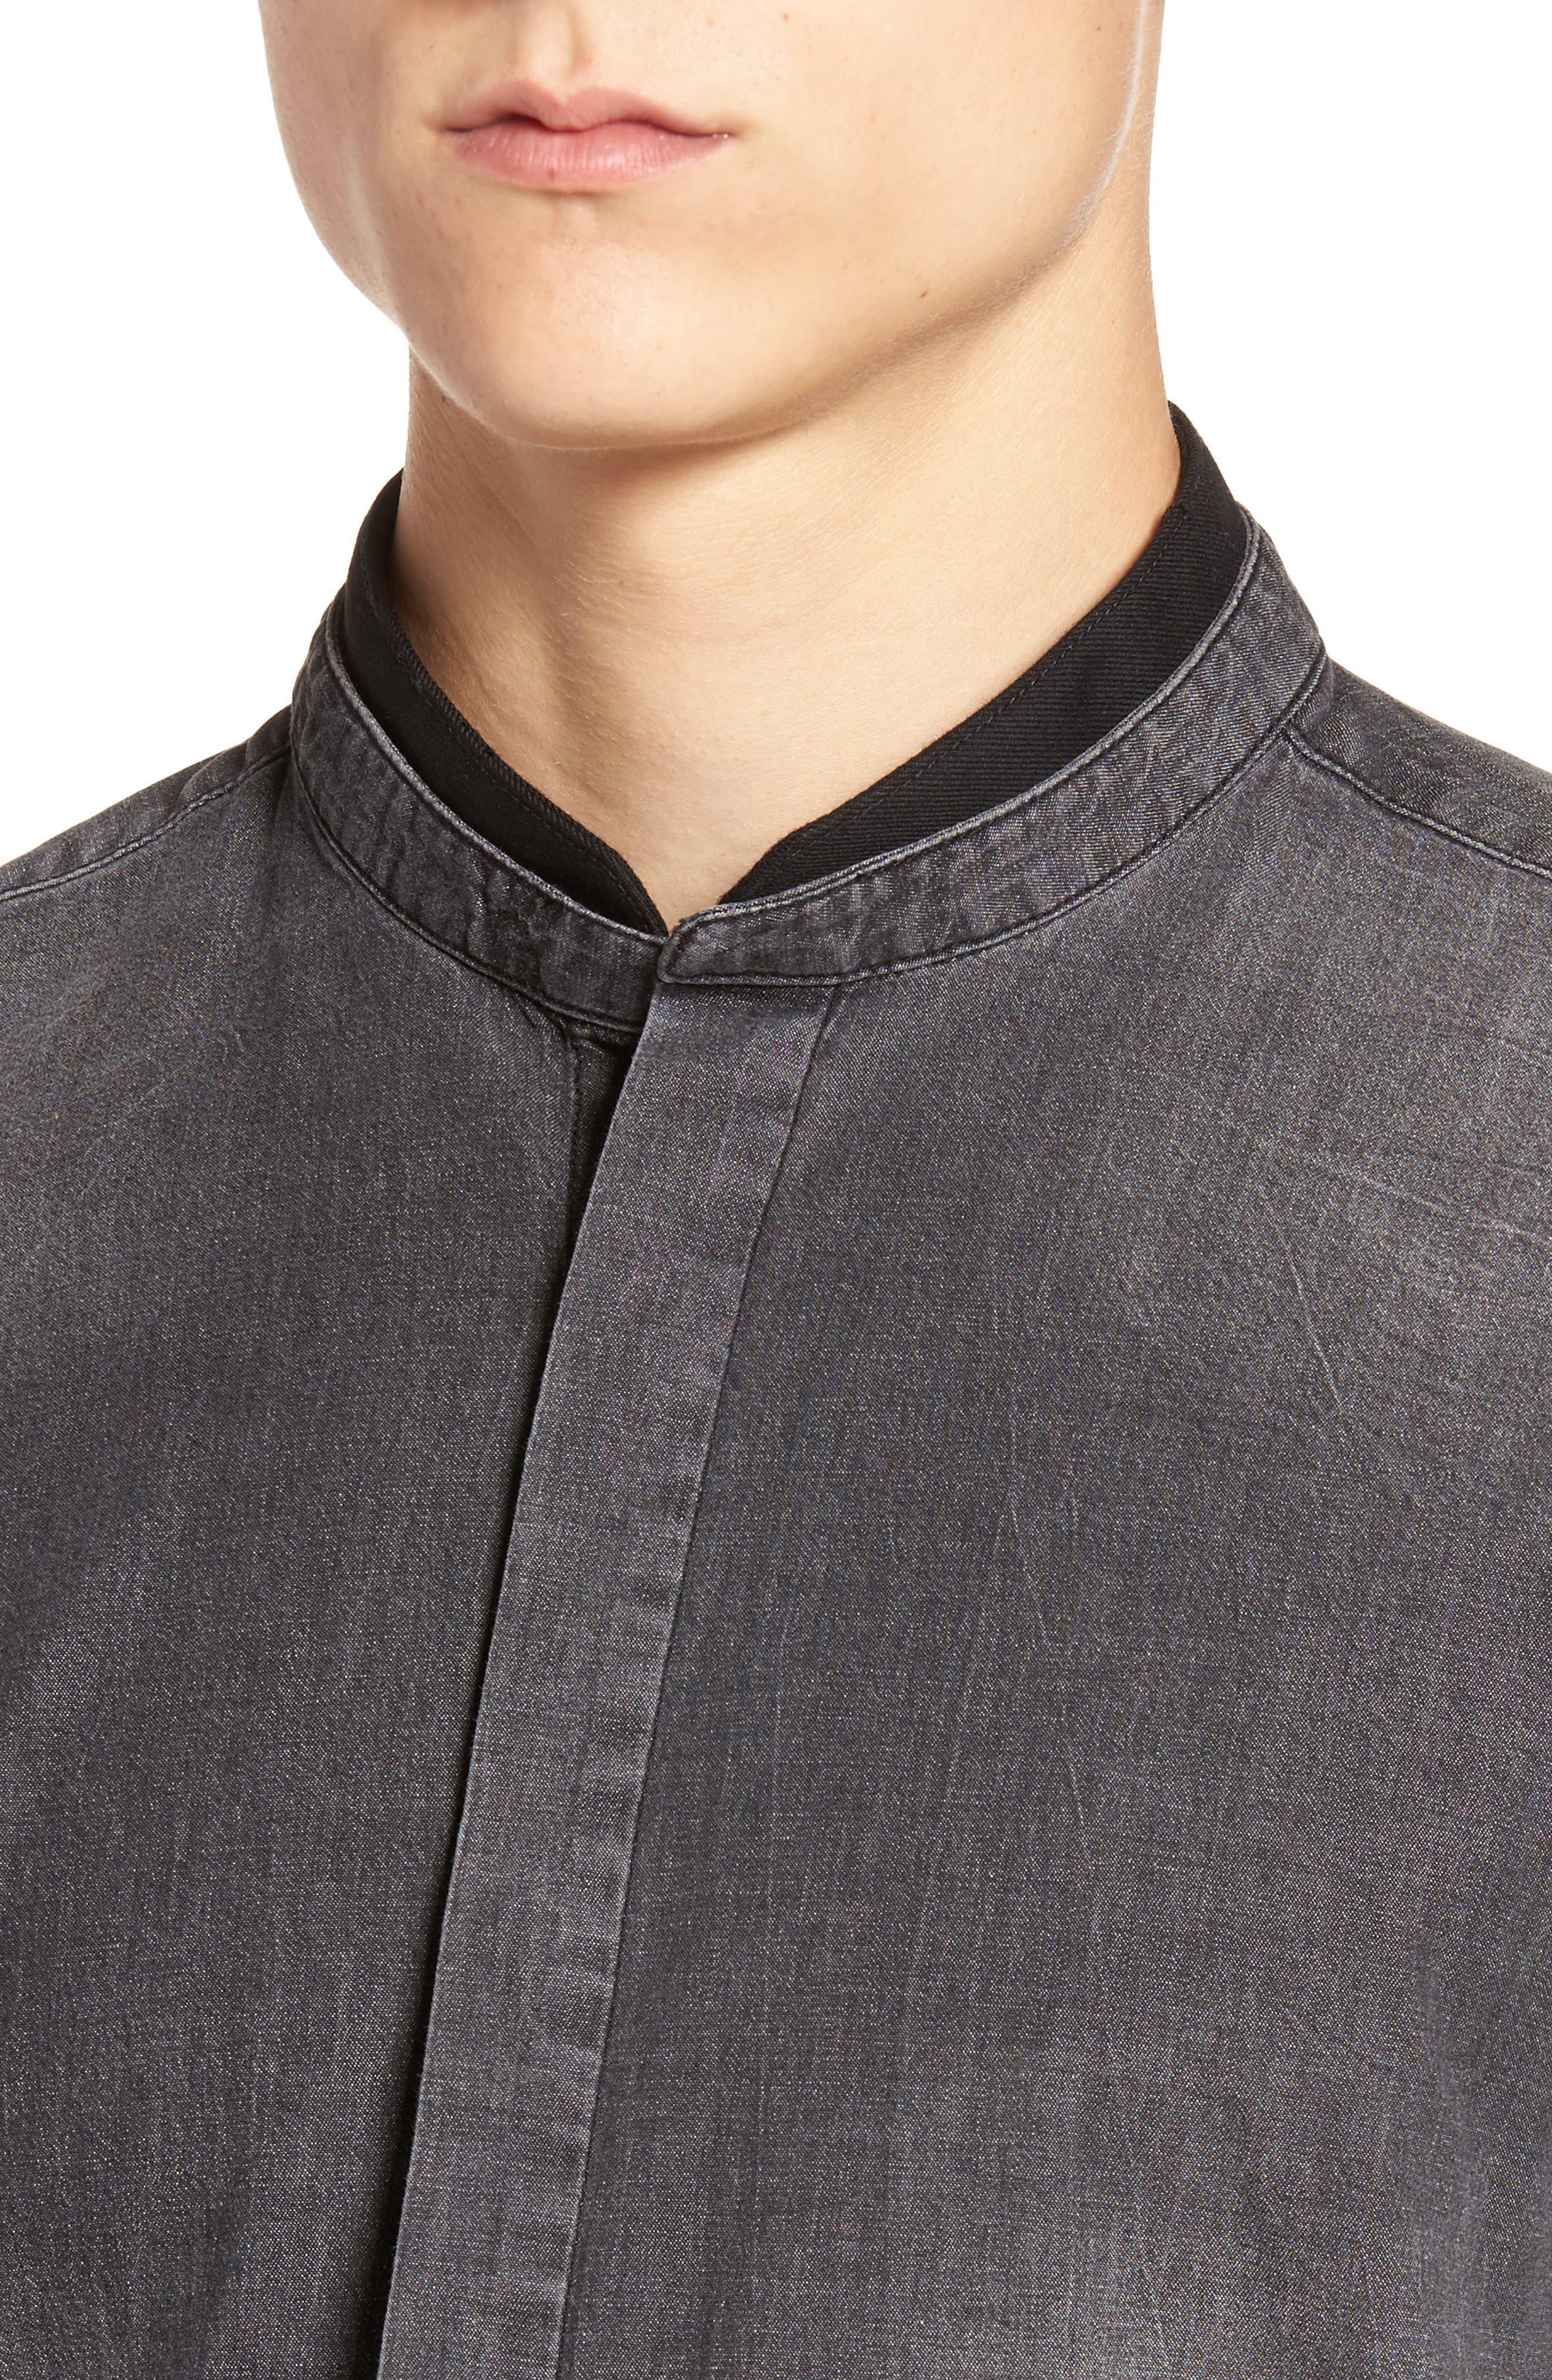 Denim Shirt,                             Alternate thumbnail 4, color,                             Black